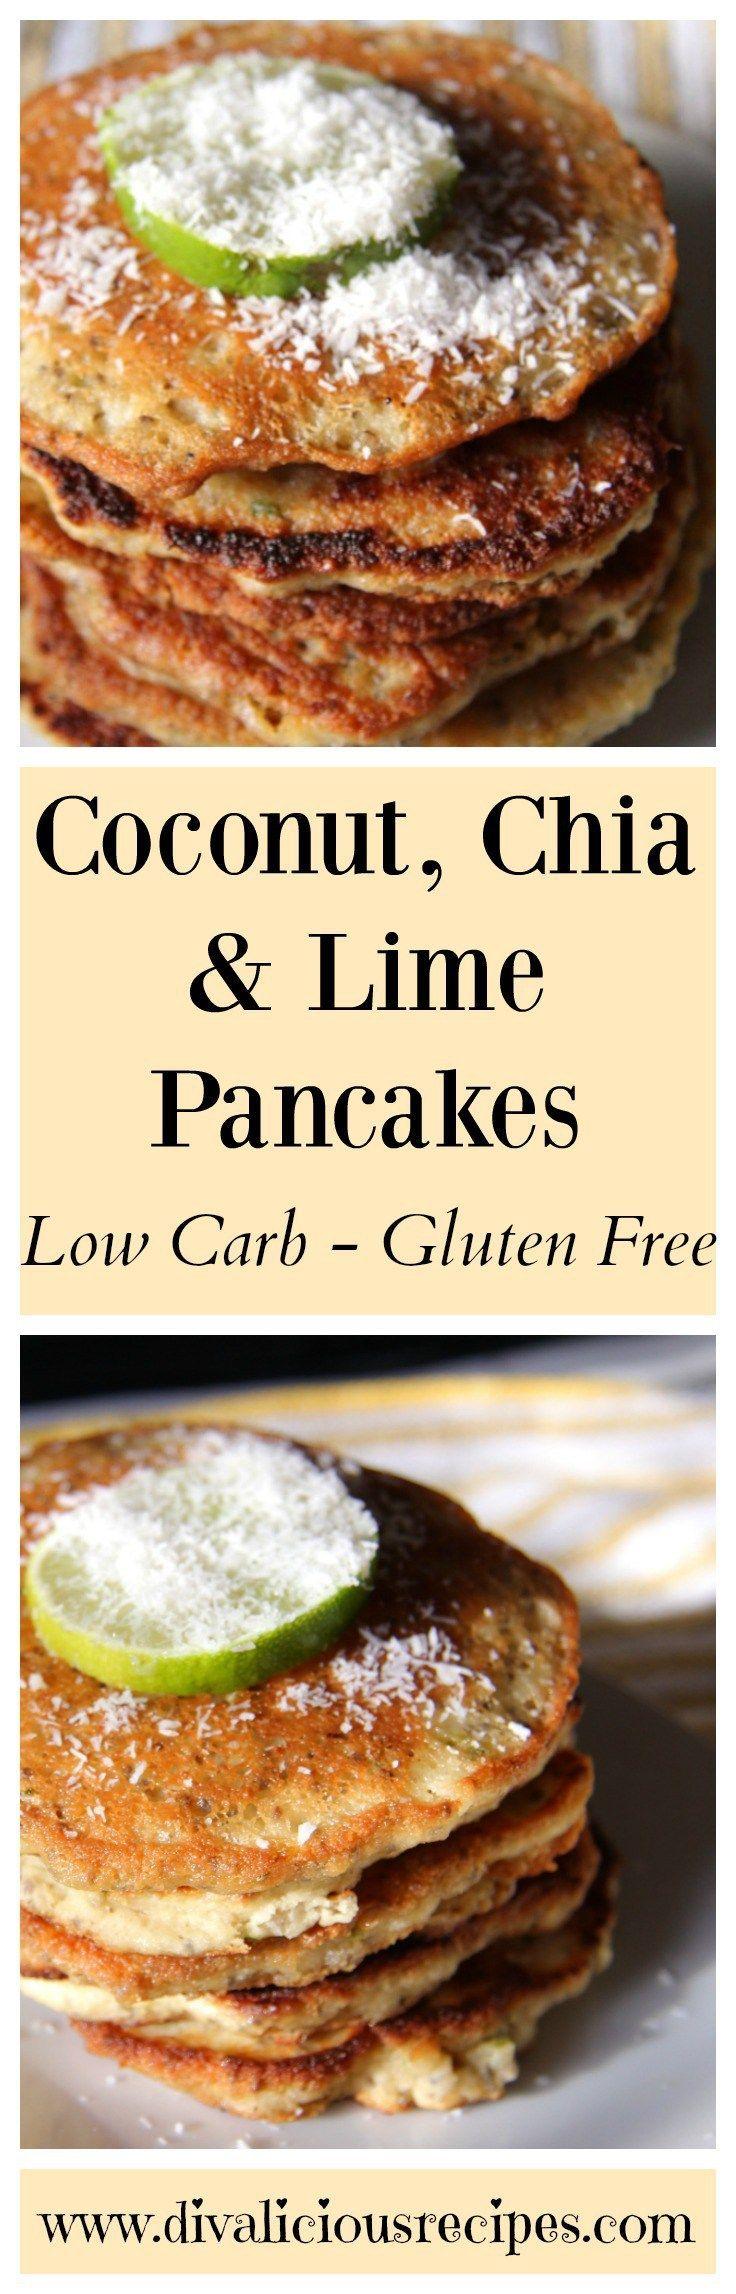 Chia pancakes made with coconut flour and chia seeds. Recipe http://divaliciousrecipes.com/2014/03/04/coconut-chia-lime-pancakes/